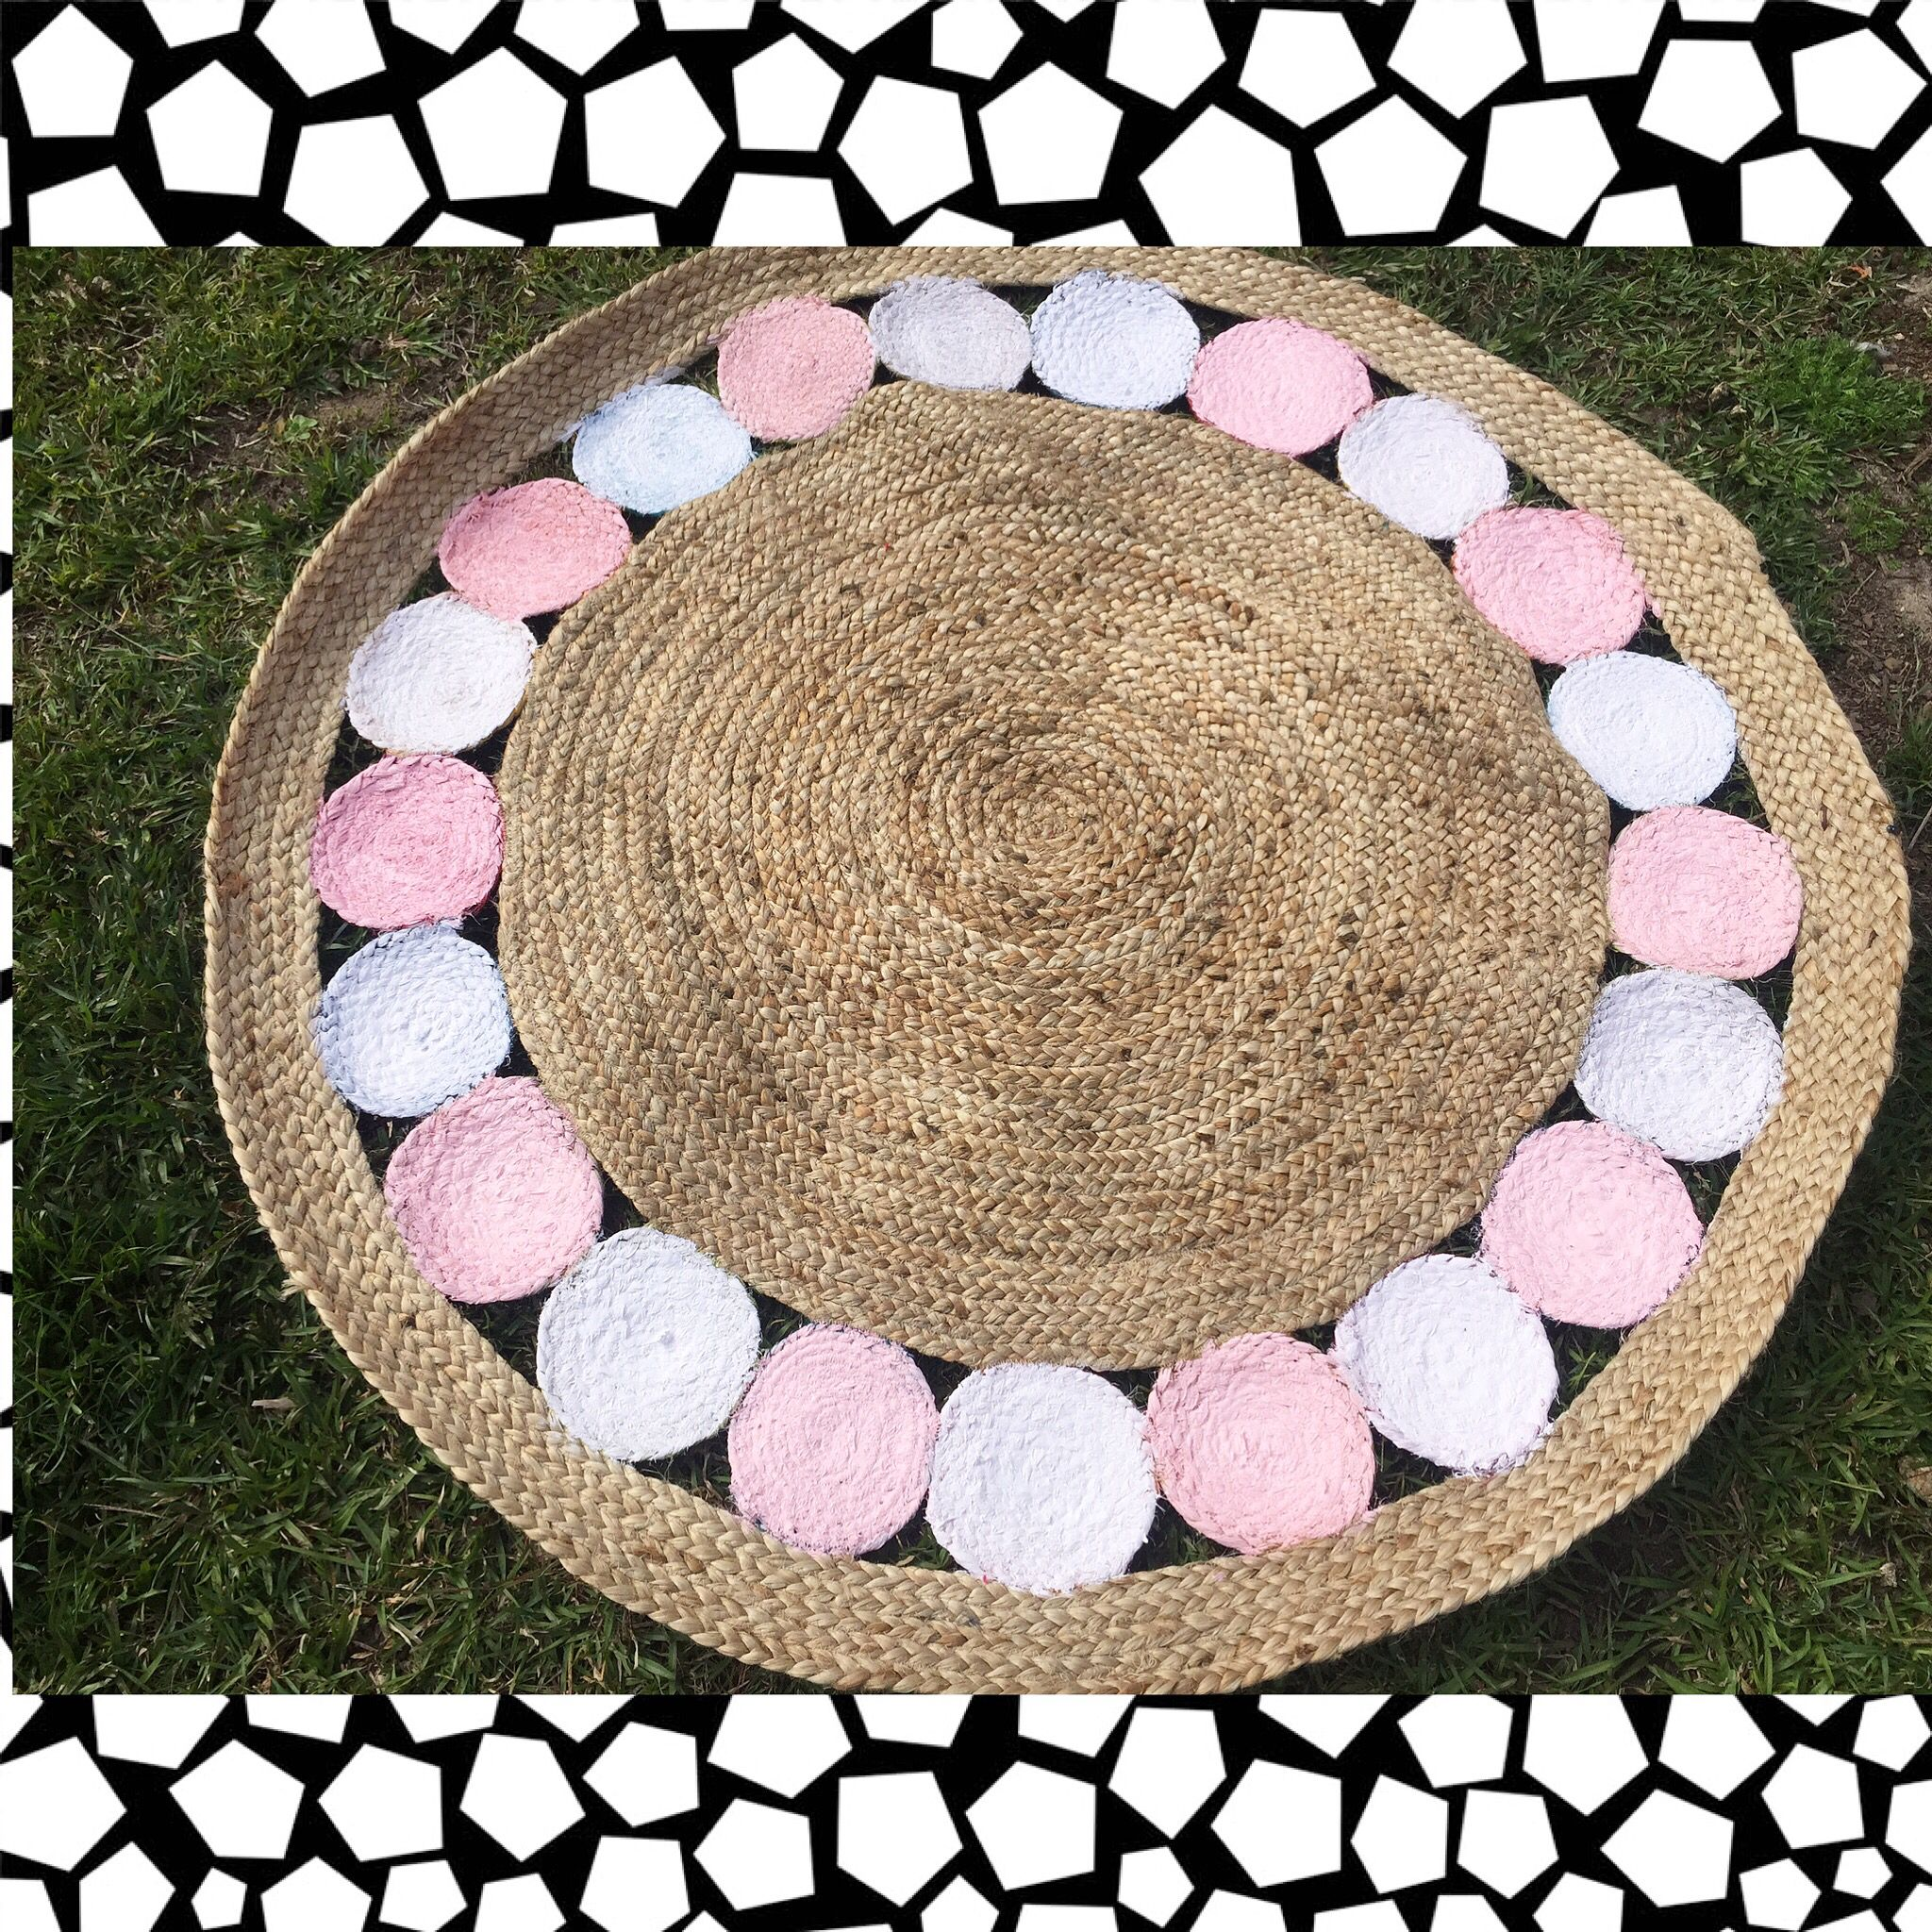 kmarthack on kmart jute circle rug | decor | pinterest | circles